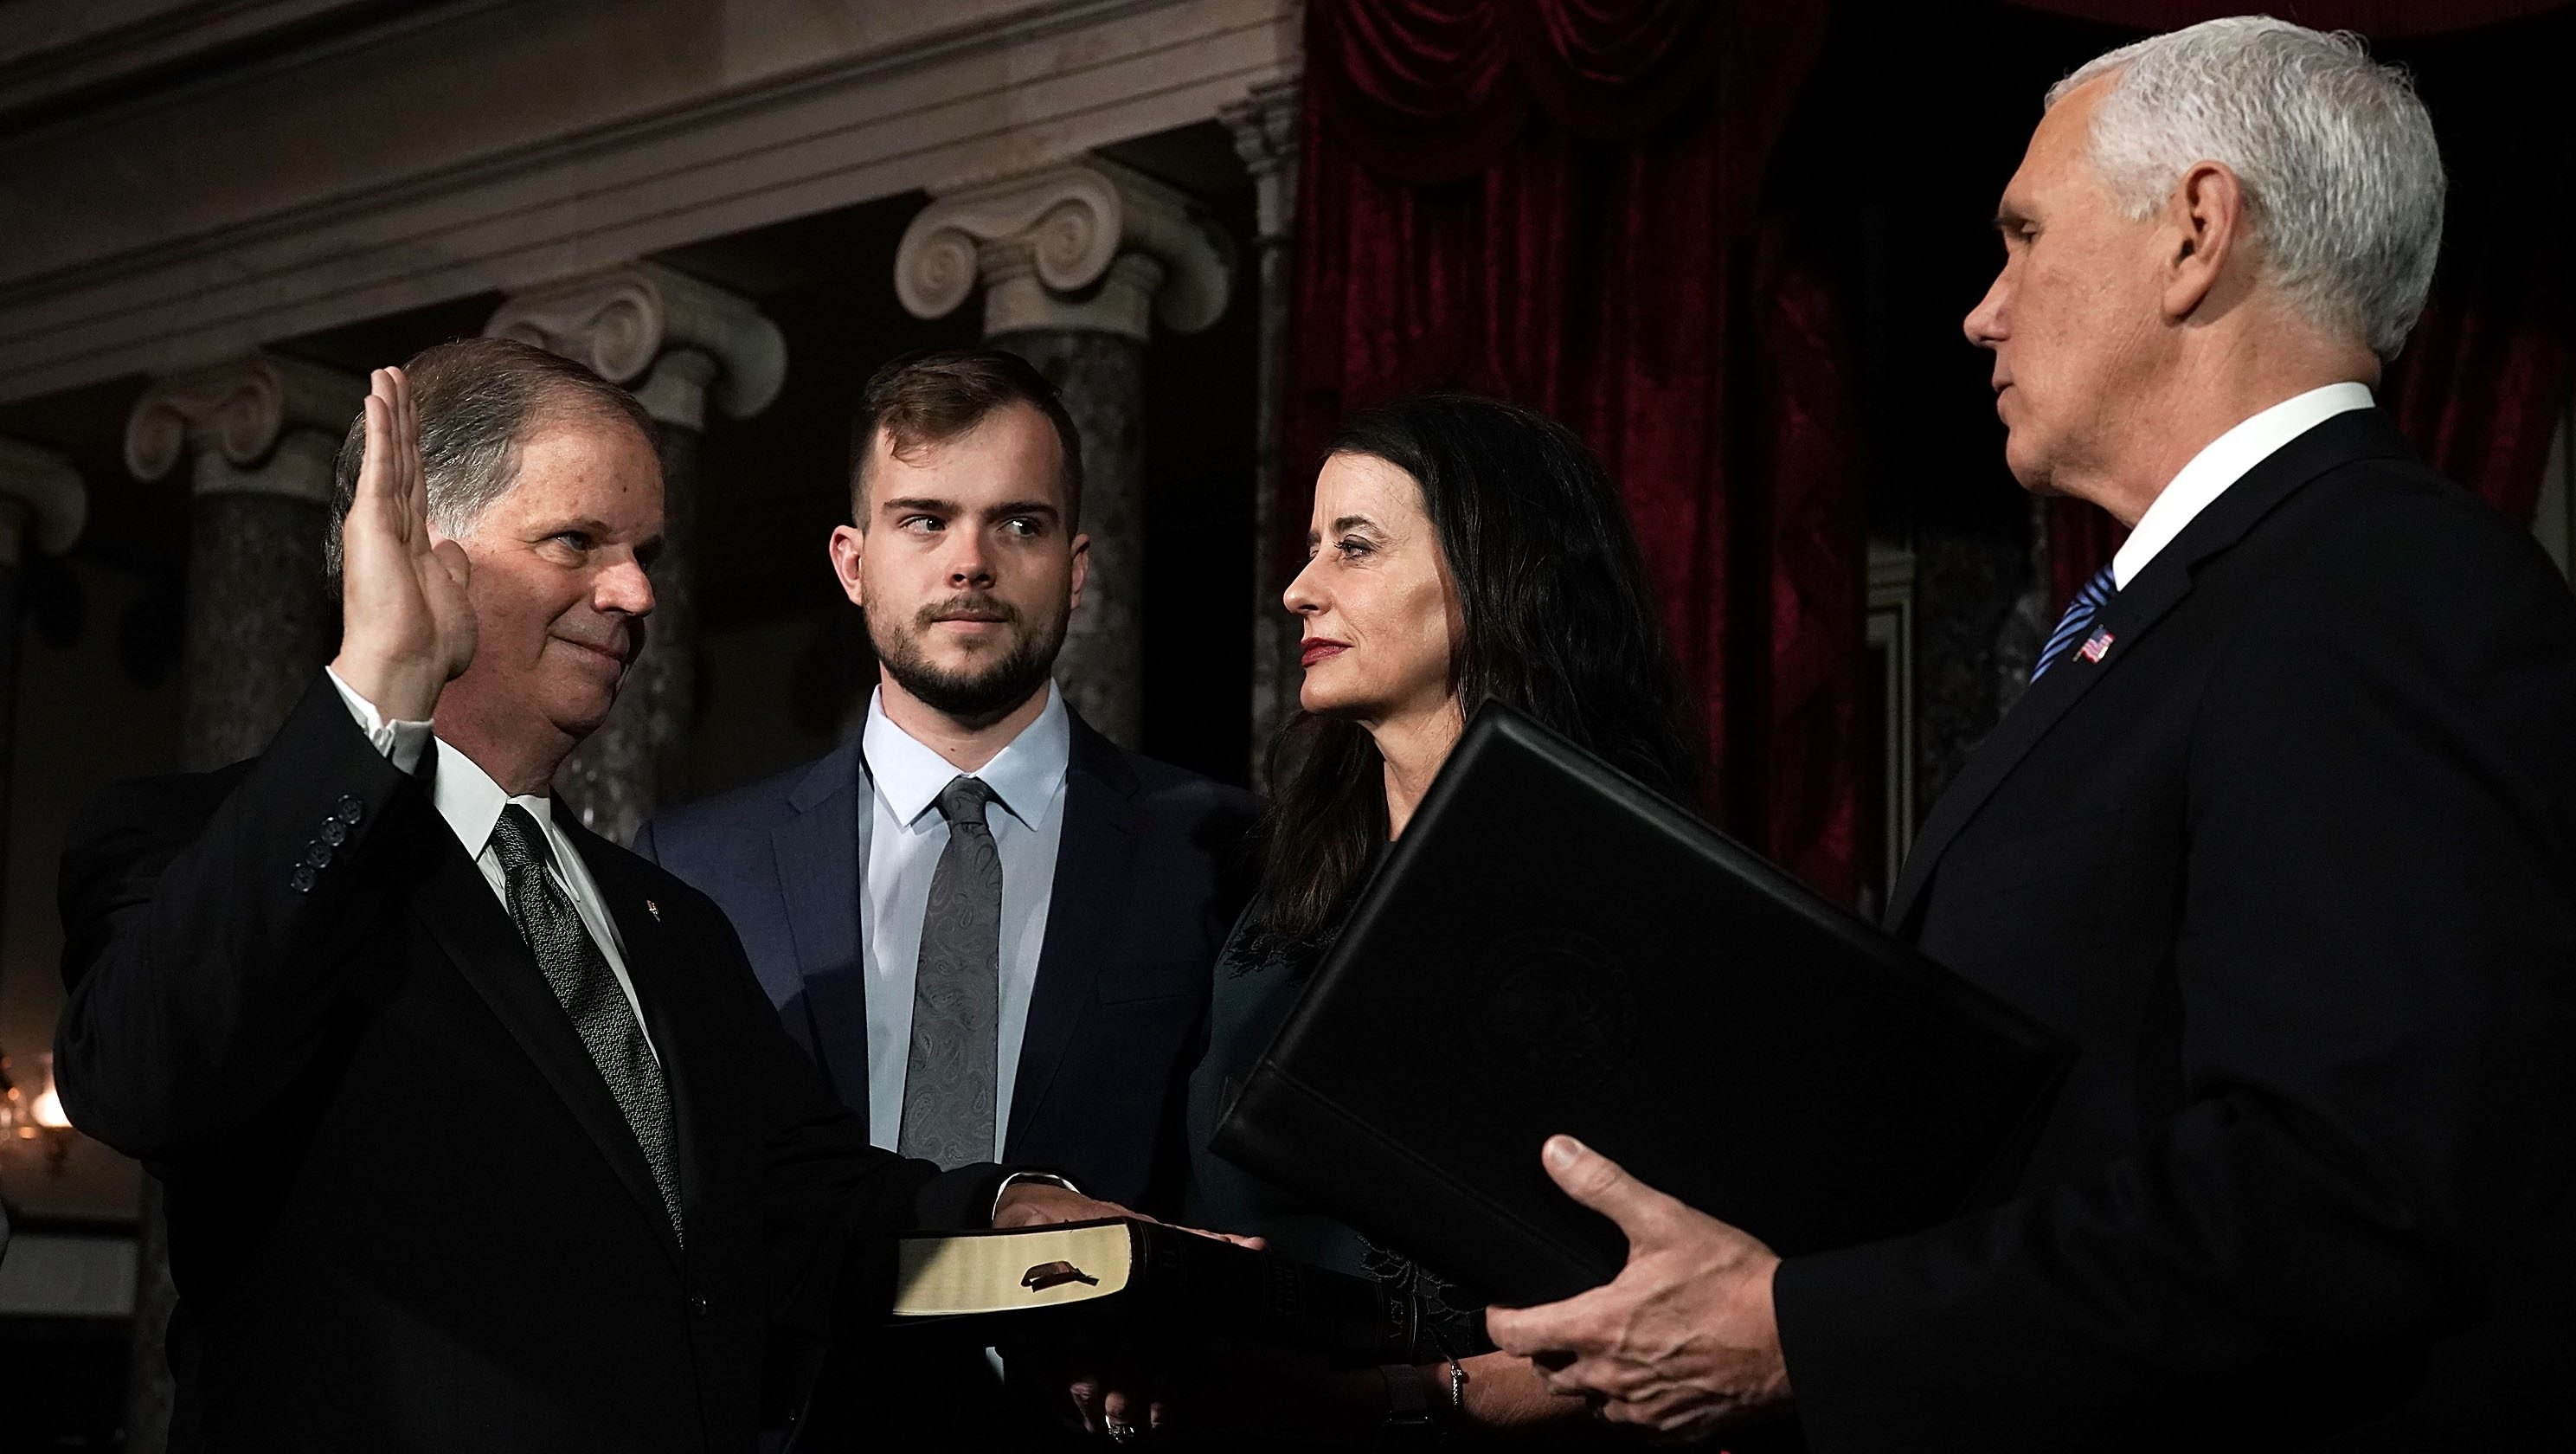 Newly Elected Senators Doug Jones And Tina Smith Sworn Into Senate